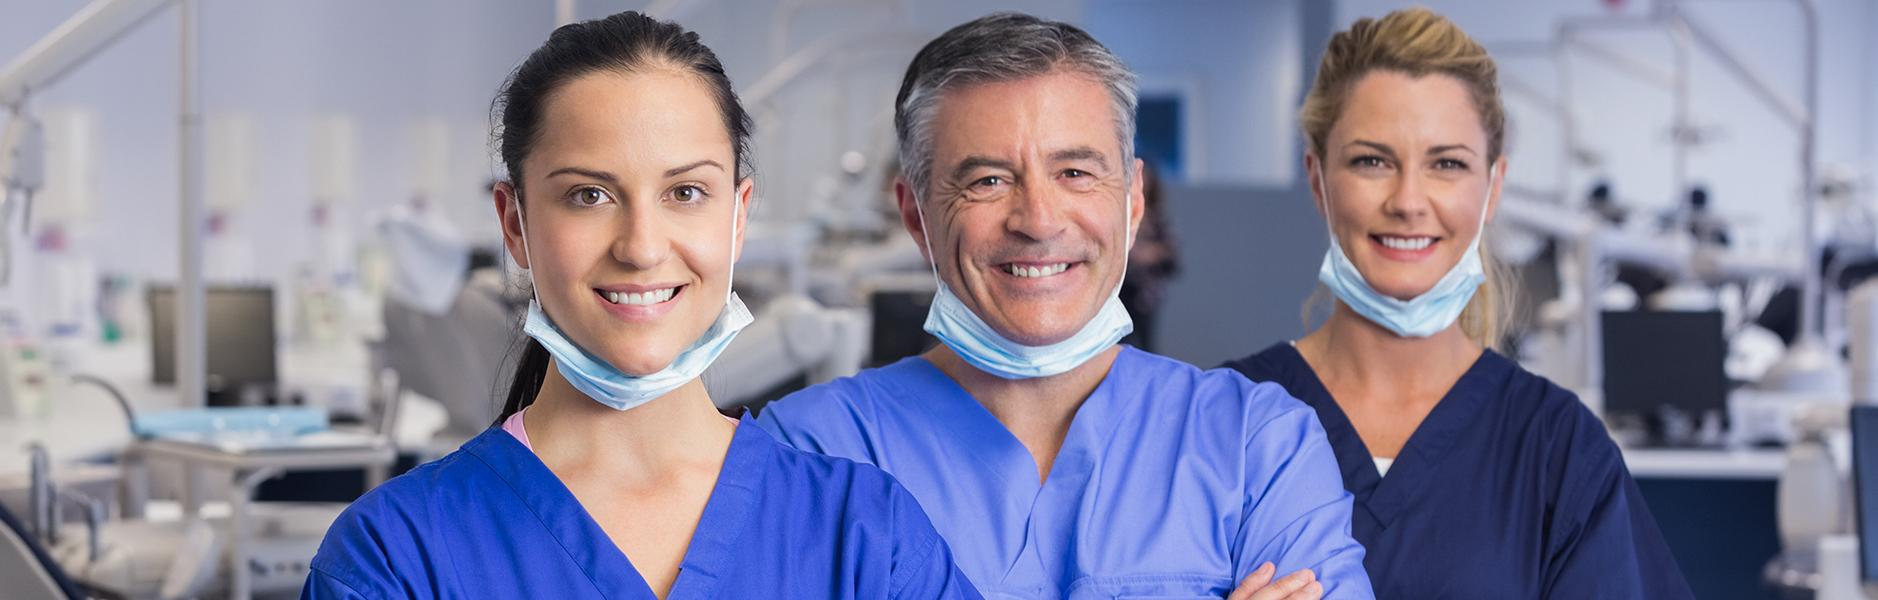 studi dentistici professionali